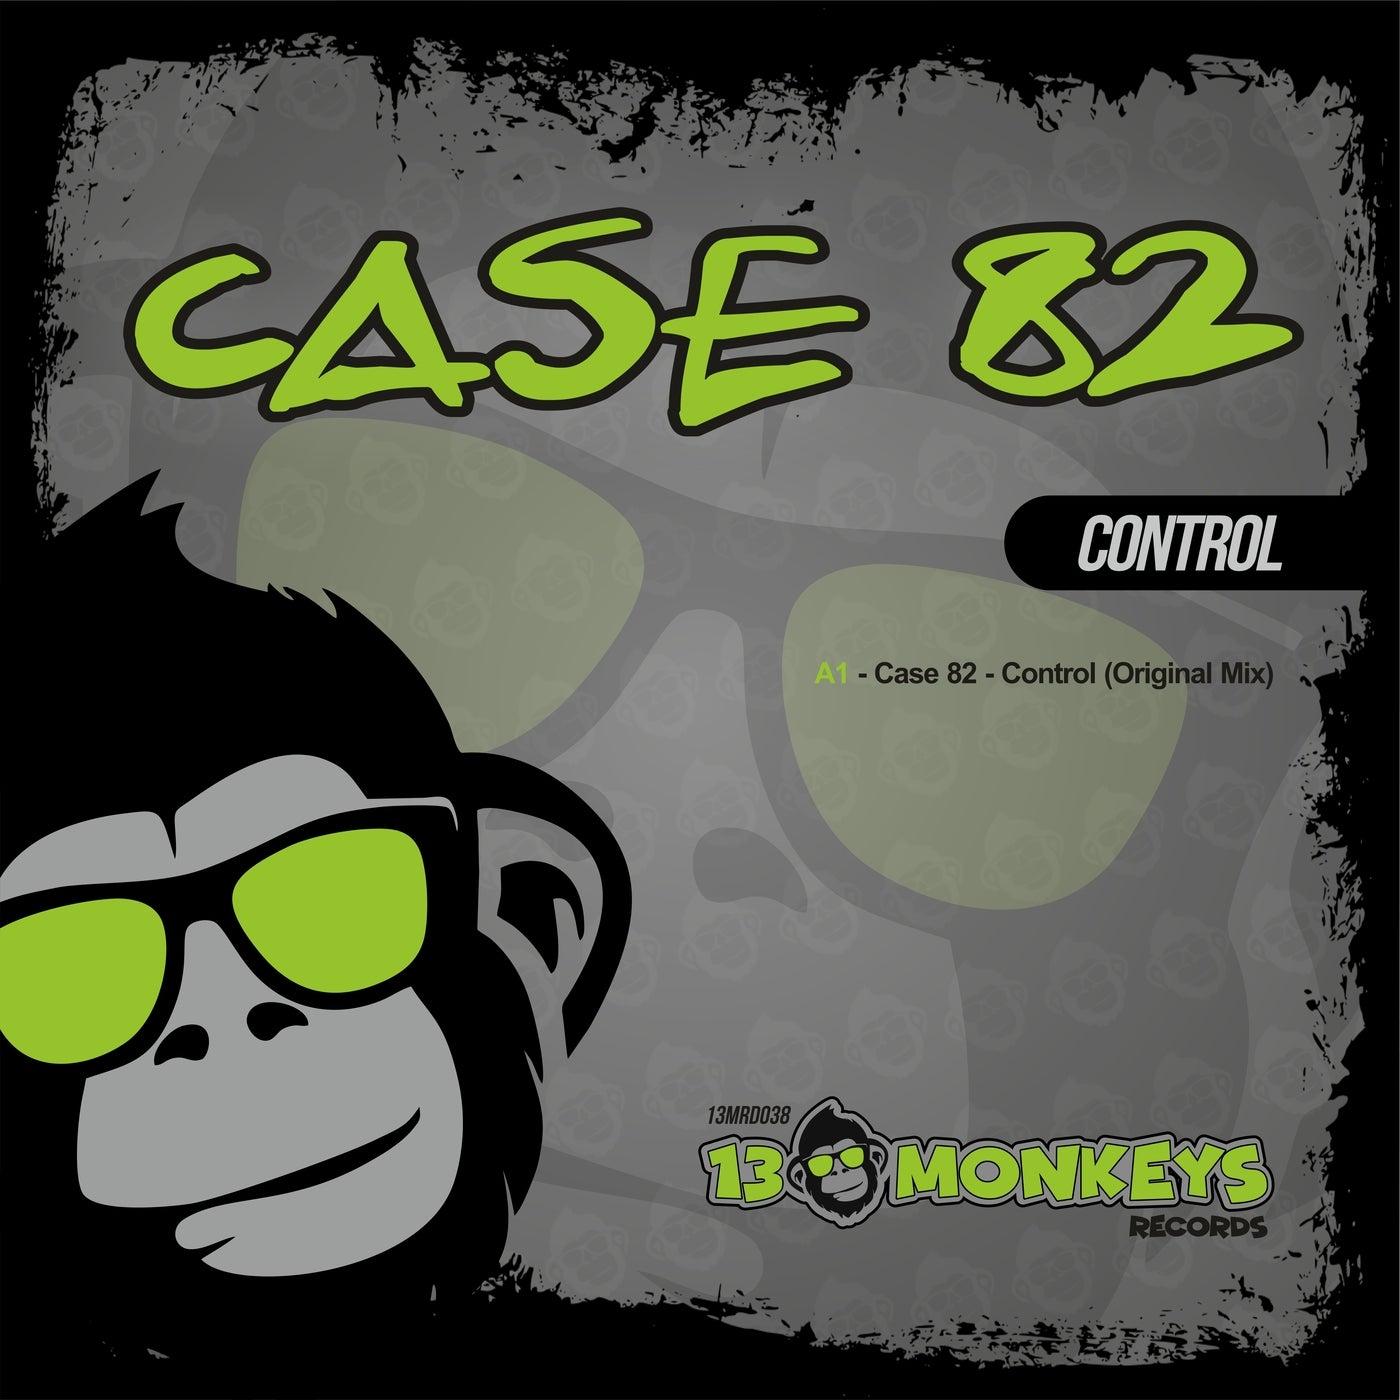 Control (Original Mix)